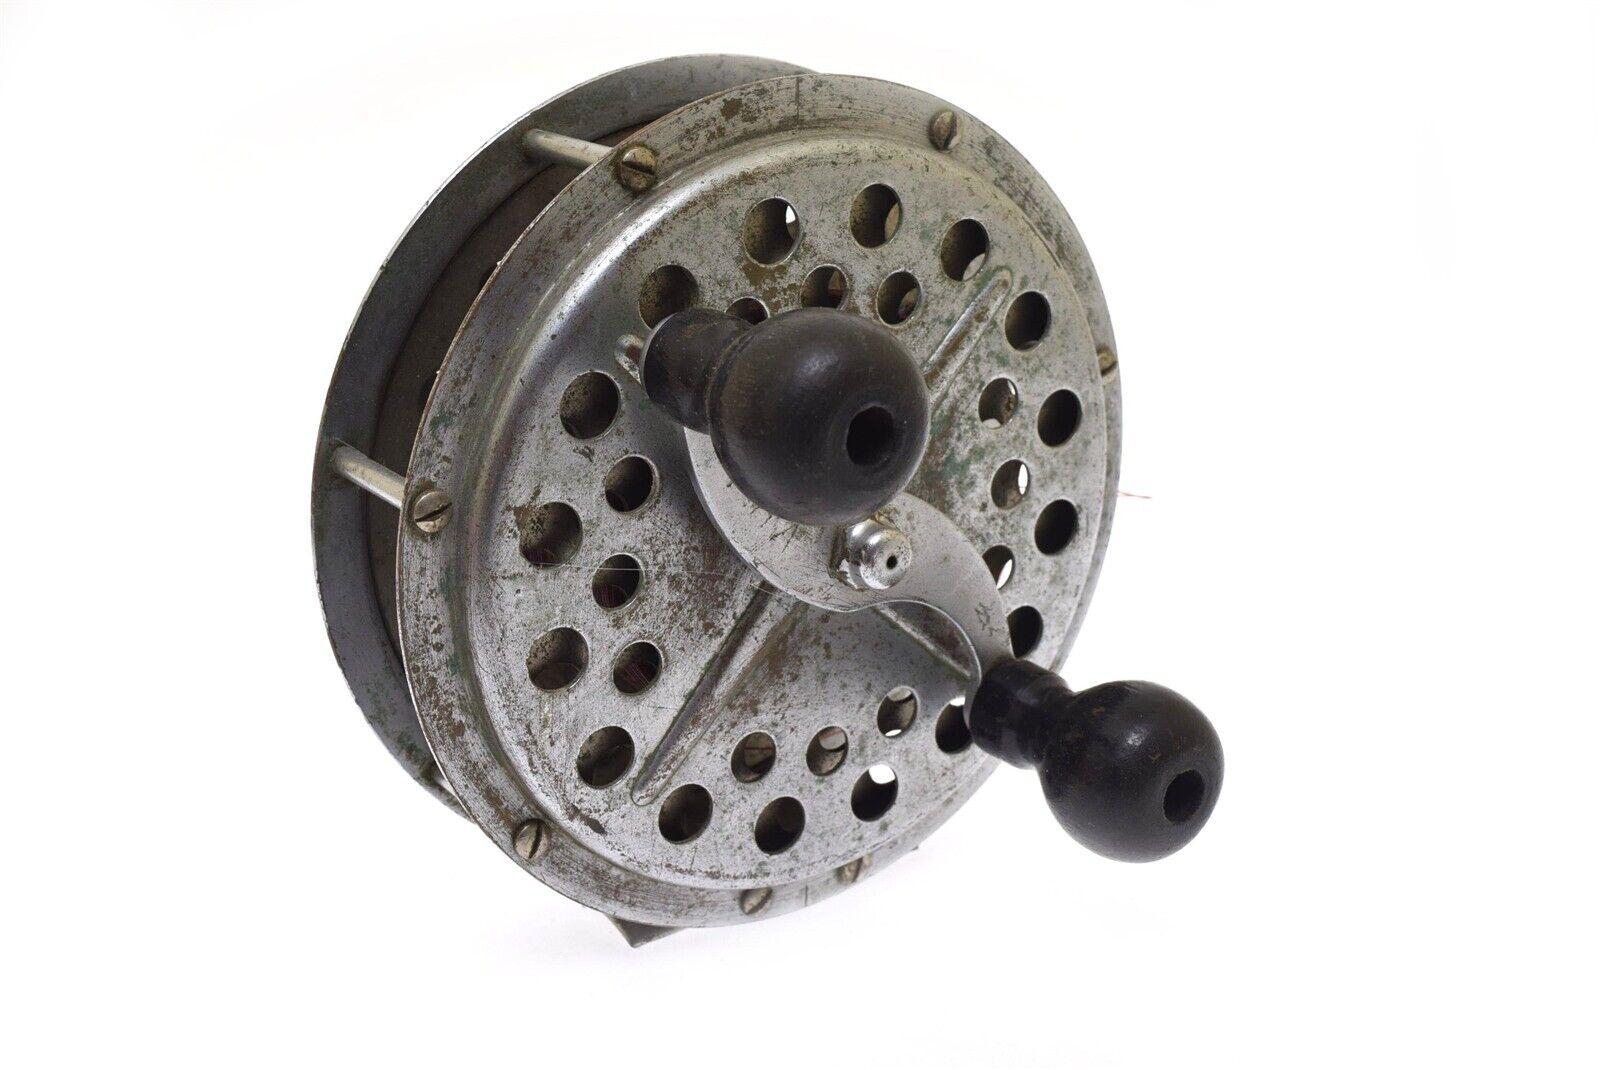 Vintage Pflueger Pakron Fishing Reel 3180 Deep Sea Fishing Reel 6.25